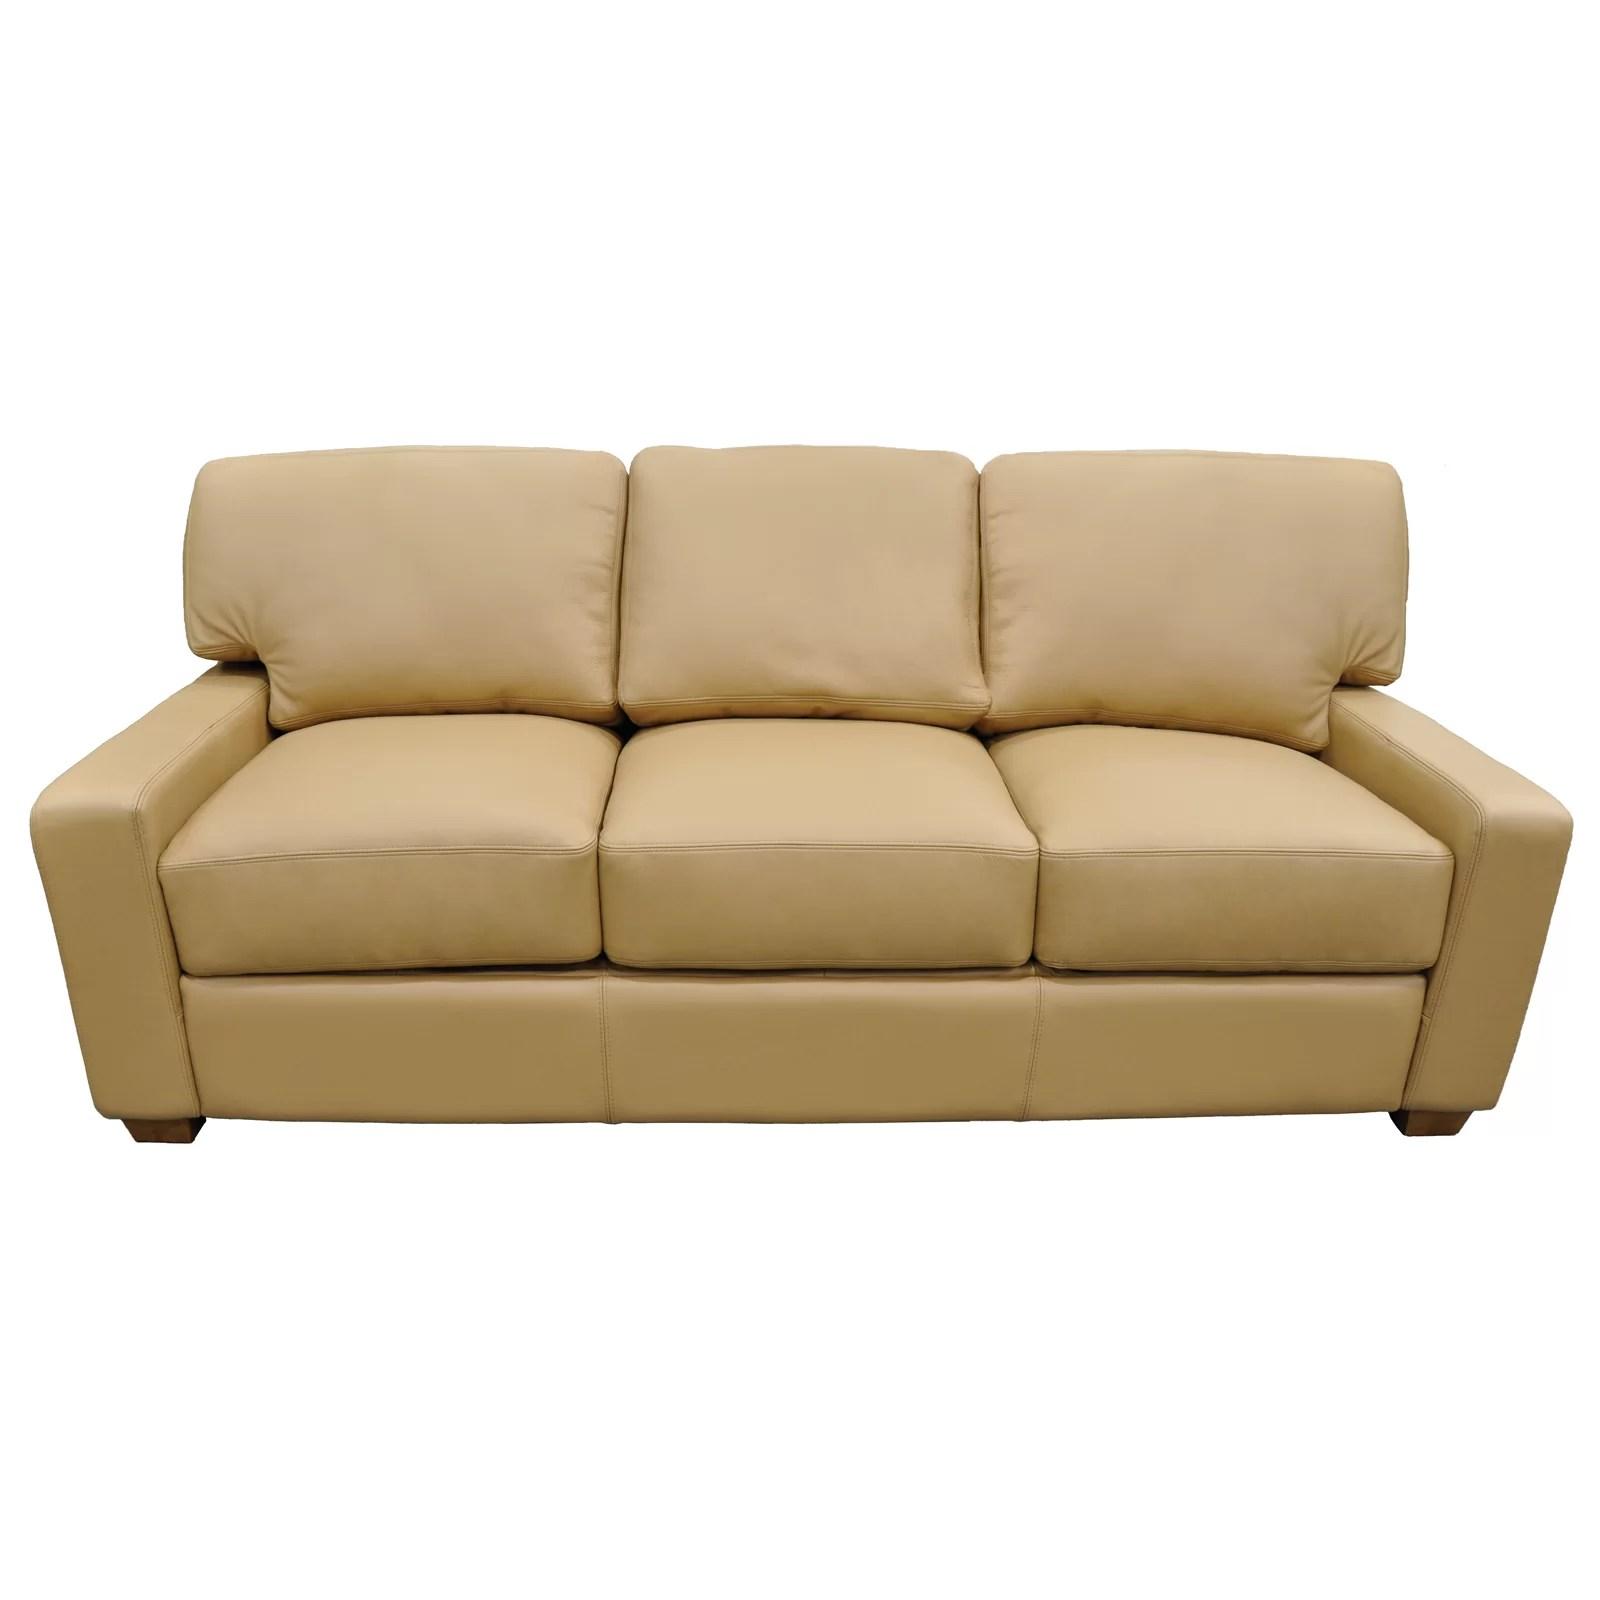 albany leather sofa modular corner bed uk omnia sectional wayfair